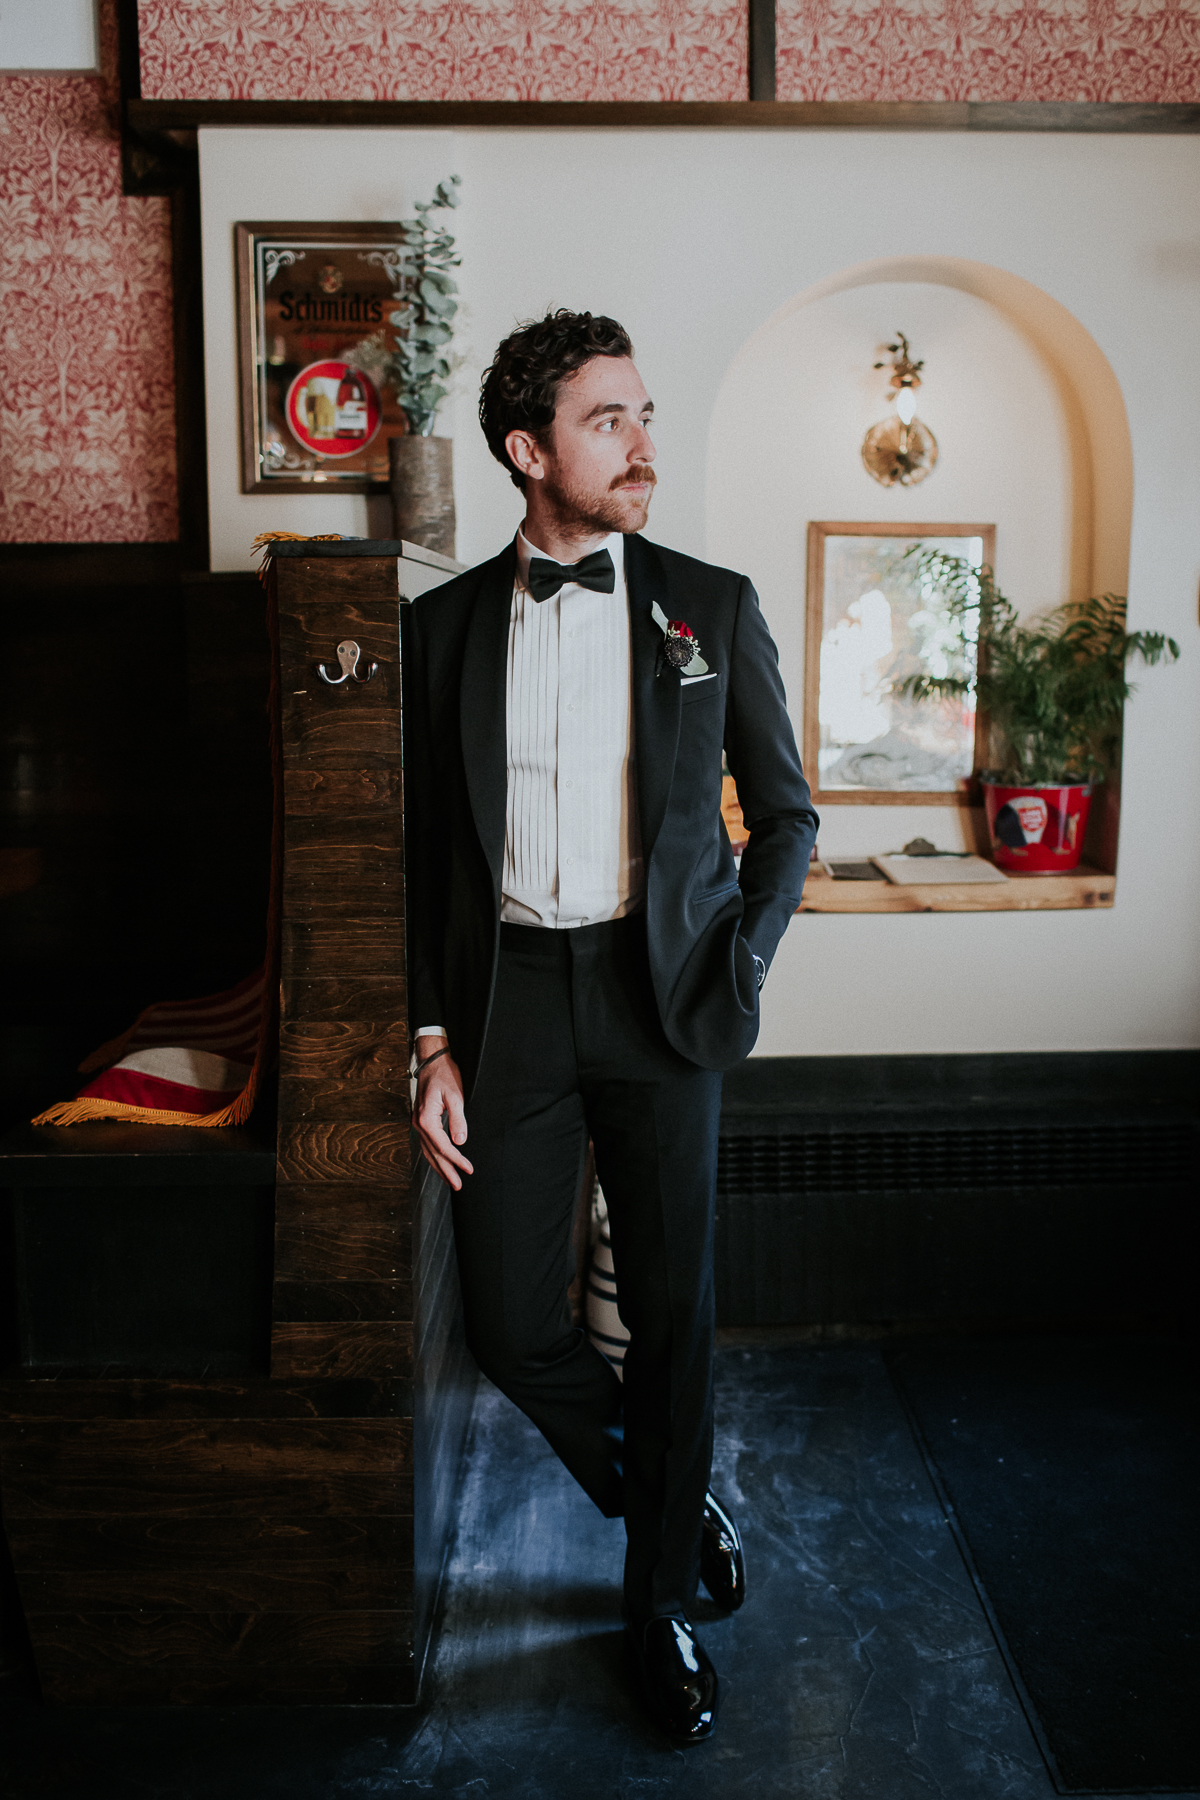 Humboldt-&-Jackson-Restaurant-Intimate-Brooklyn-Documentary-Wedding-Photographer-80.jpg